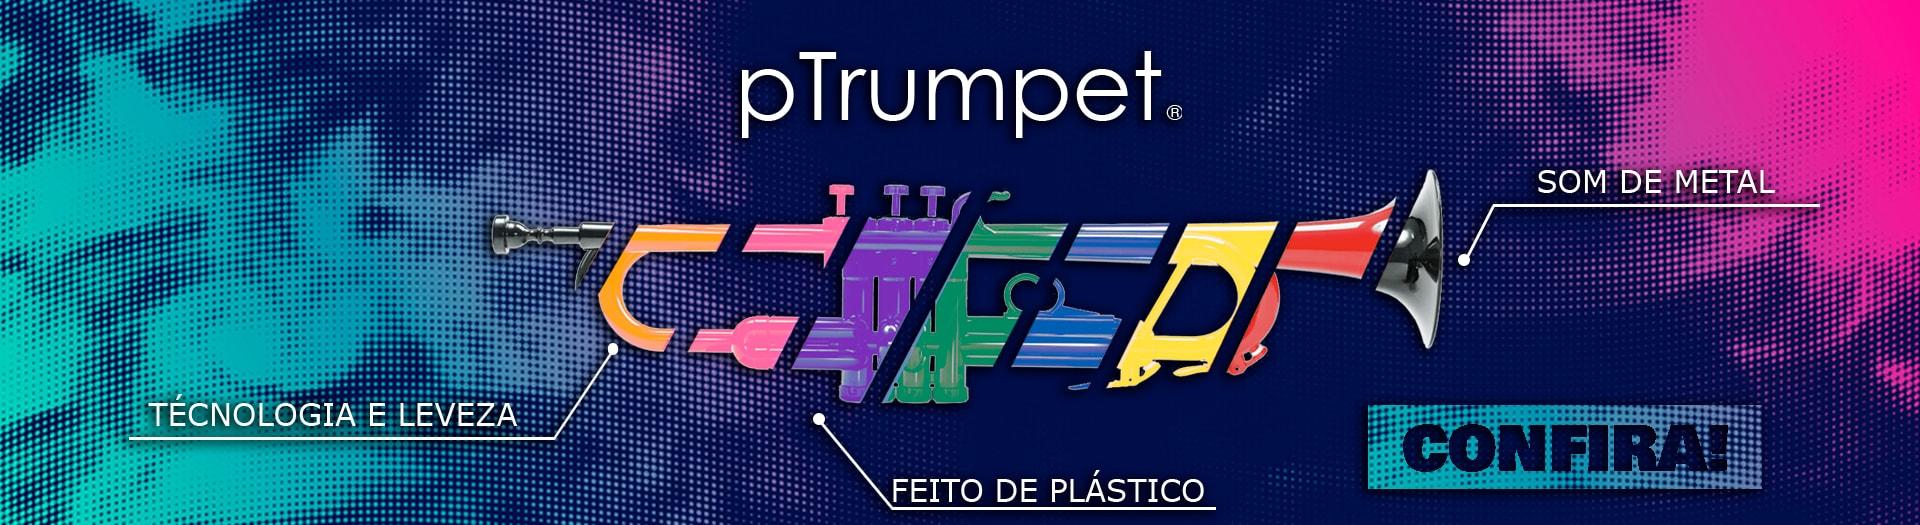 pTRUMPET - Desktop